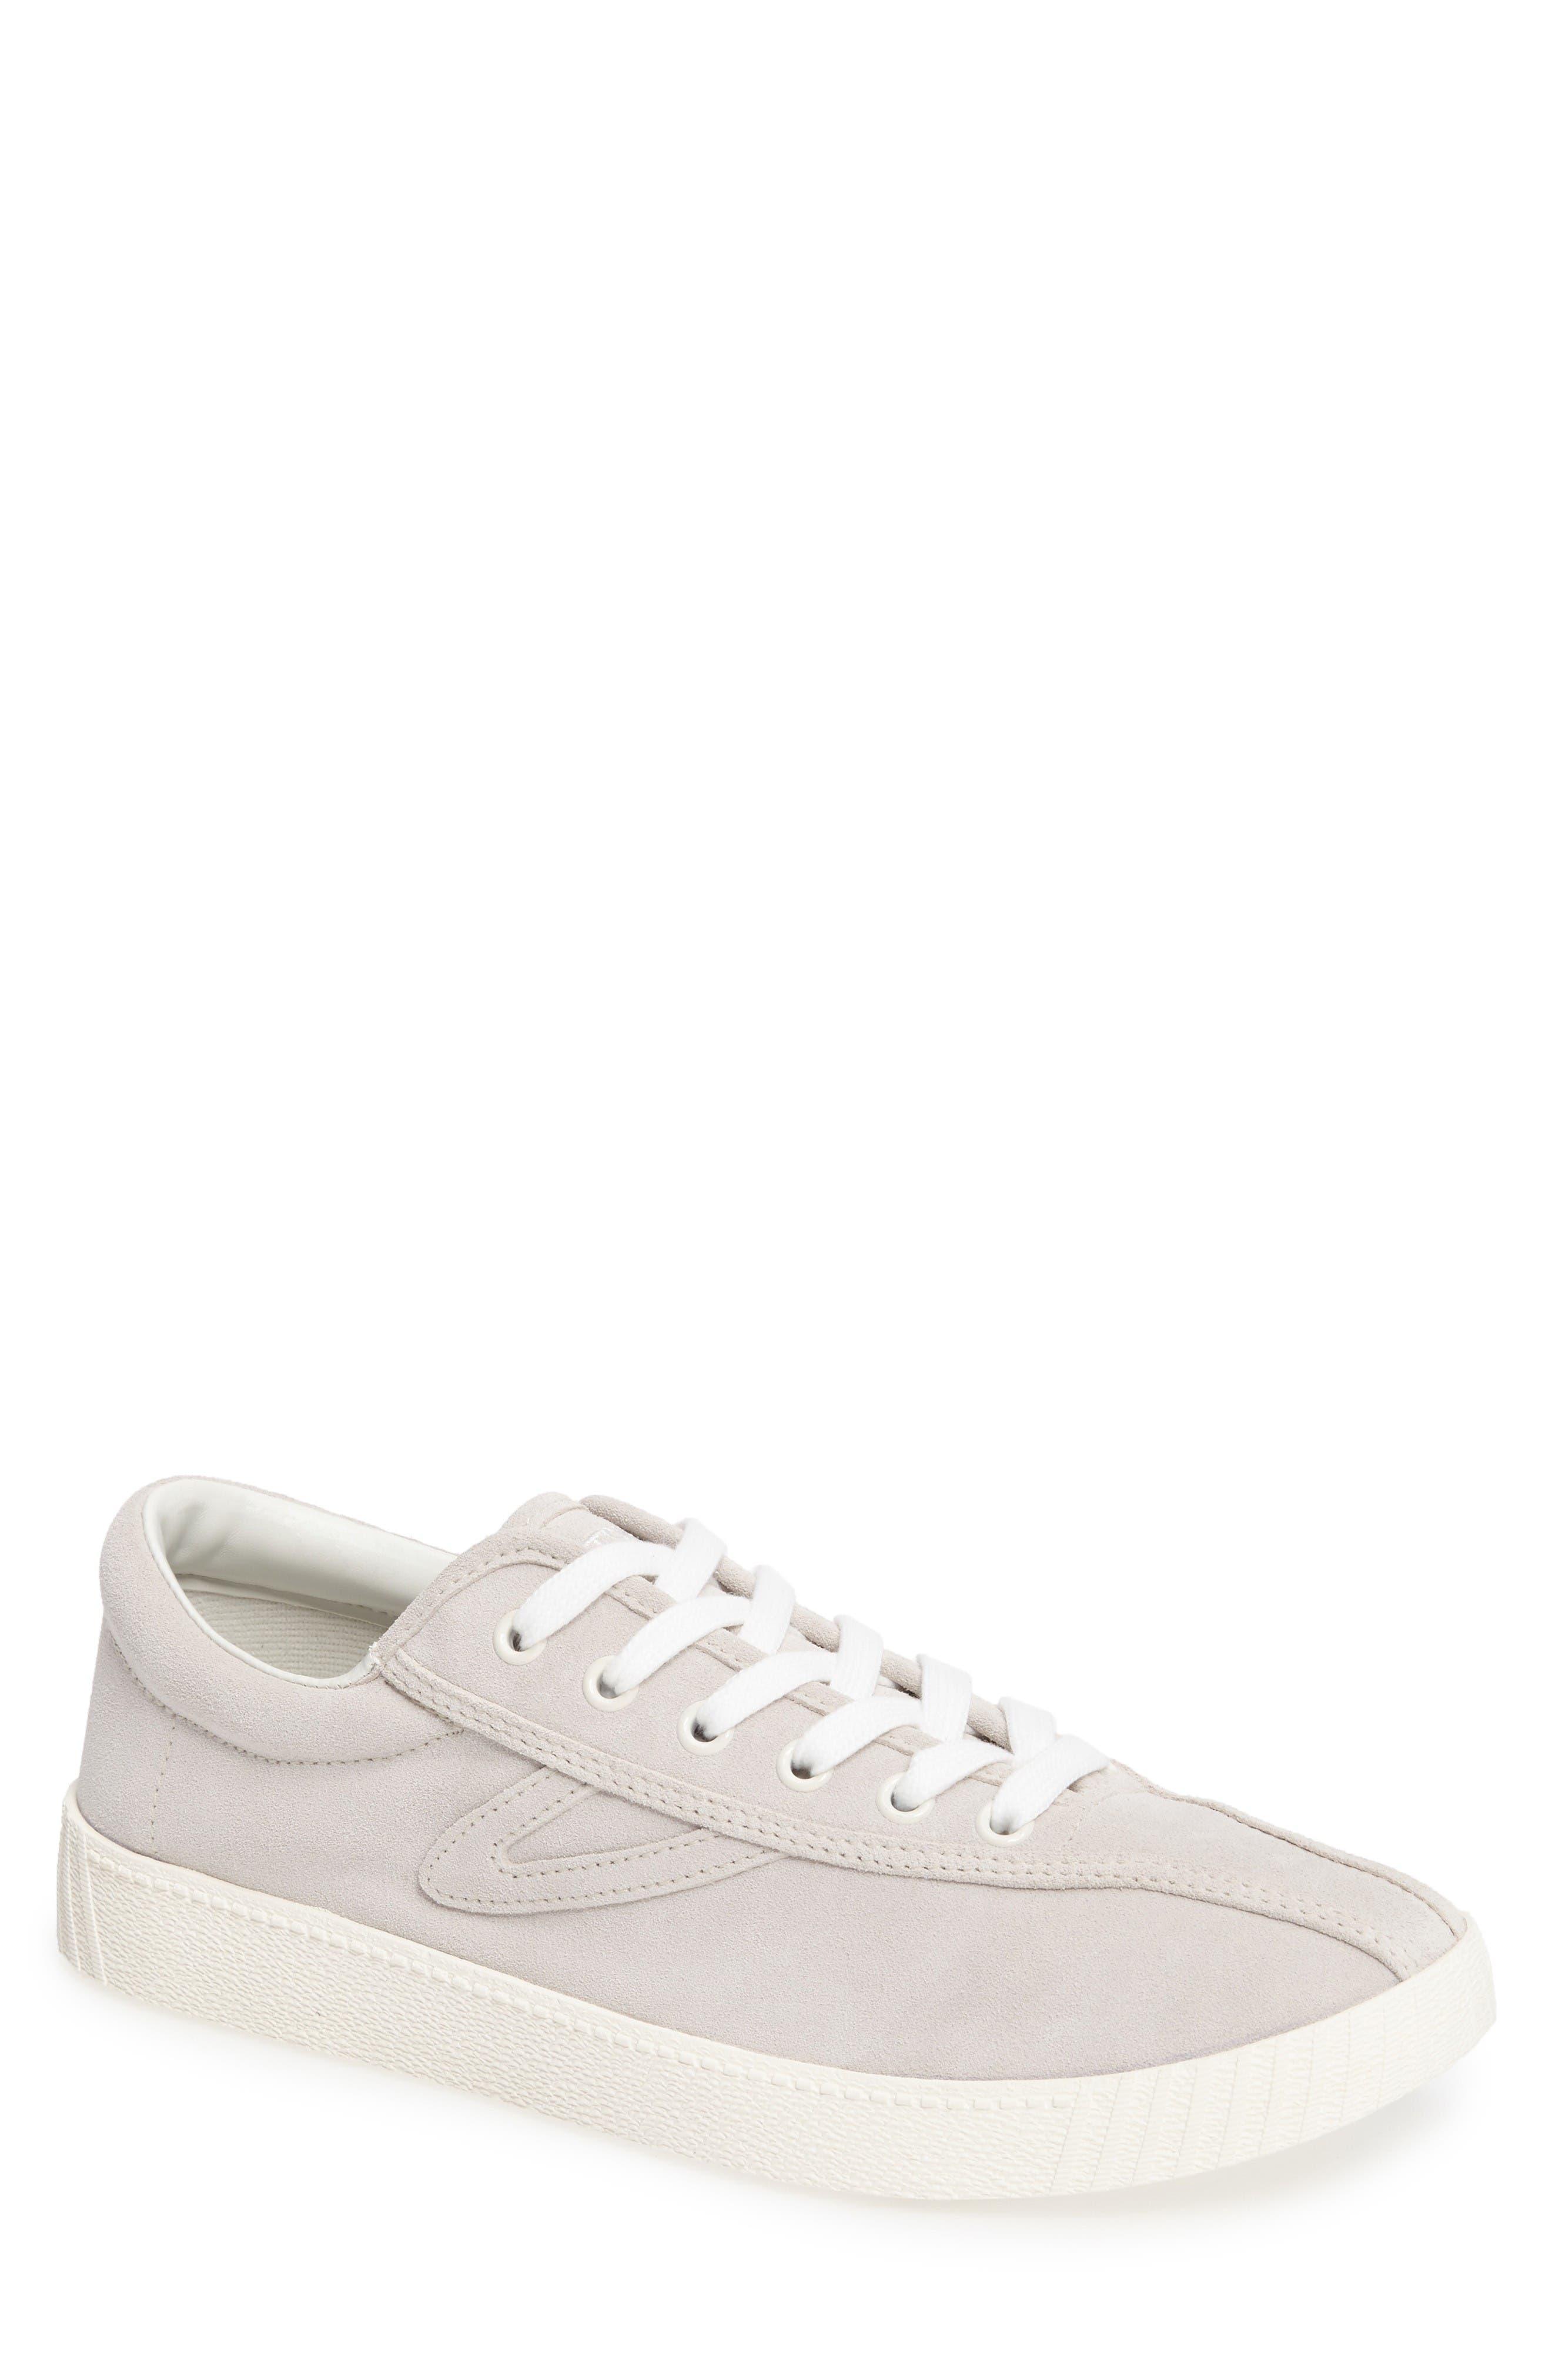 TRETORN Nylite 2 Plus Sneaker